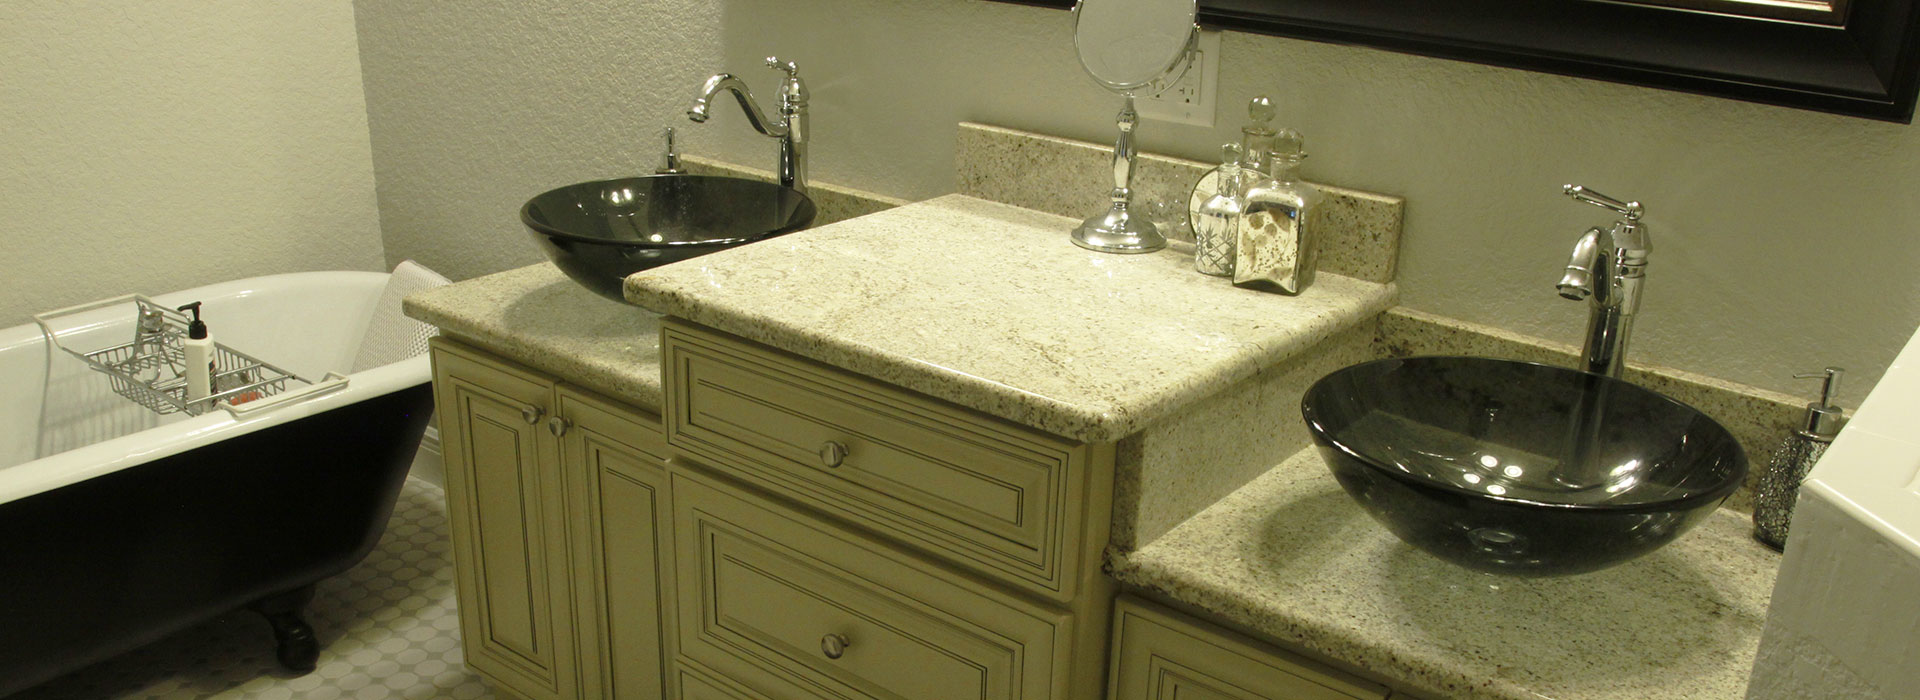 excalibur kitchen and bath llc ocala, florida